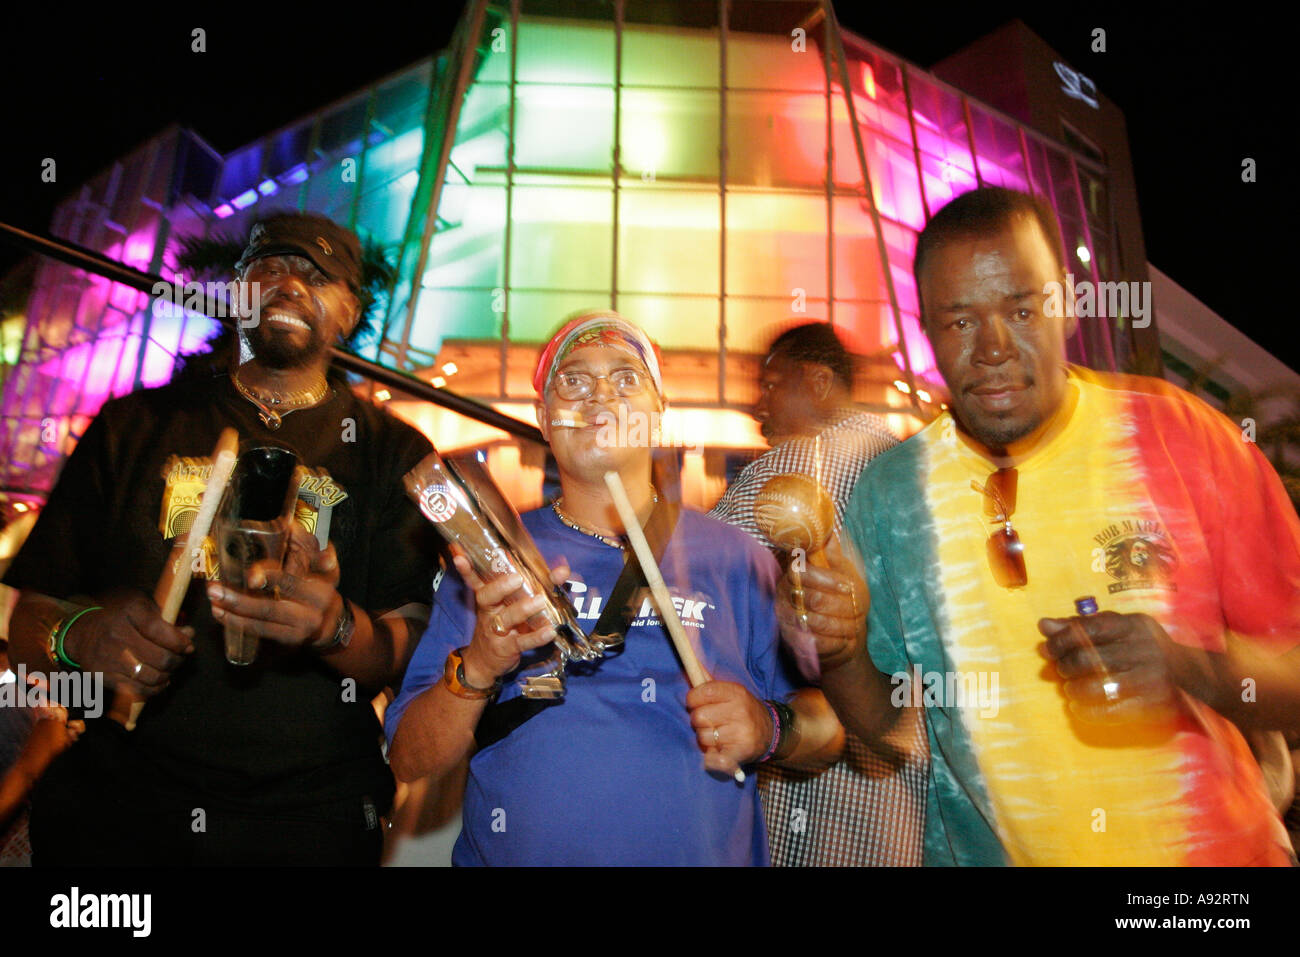 Dancing With Haitians At La Fete De >> Miami Beach Florida 5th Fifth Street Haitian Rara Band Parade Dance